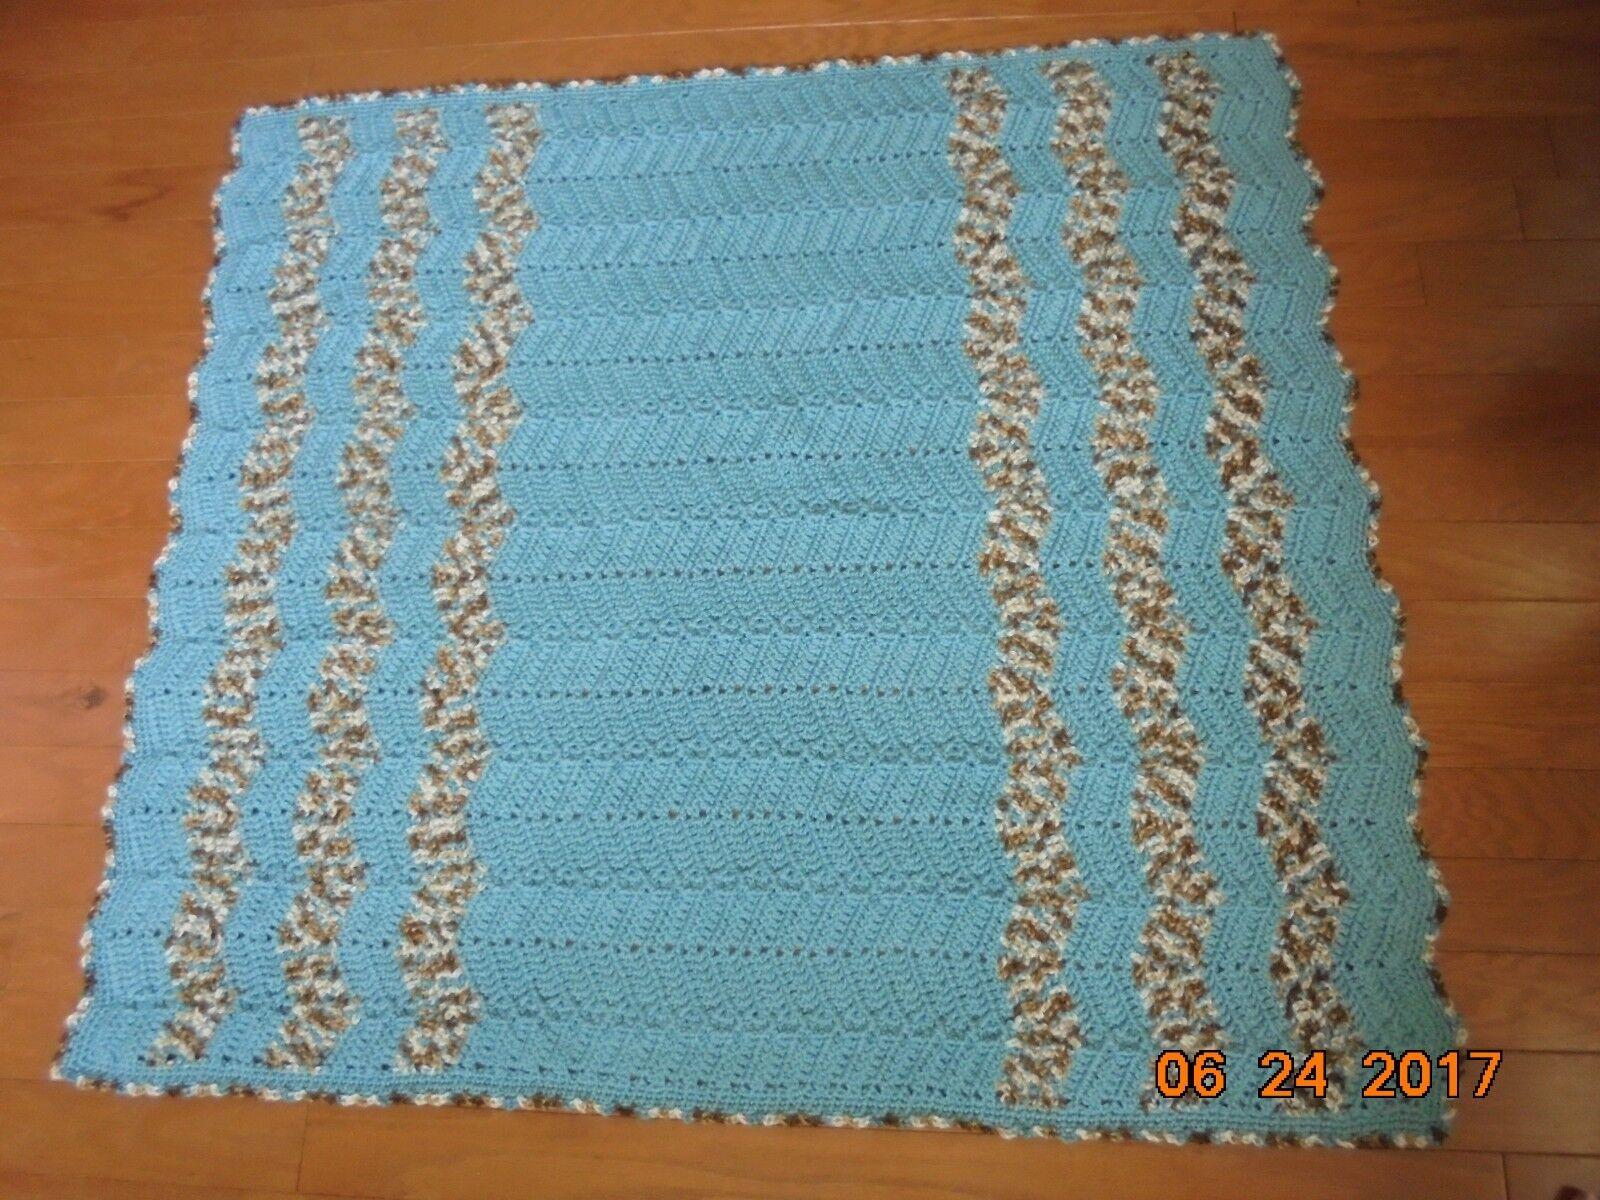 Handmade Crocheted Afghan Blanket New Seafoam and Icy Pond